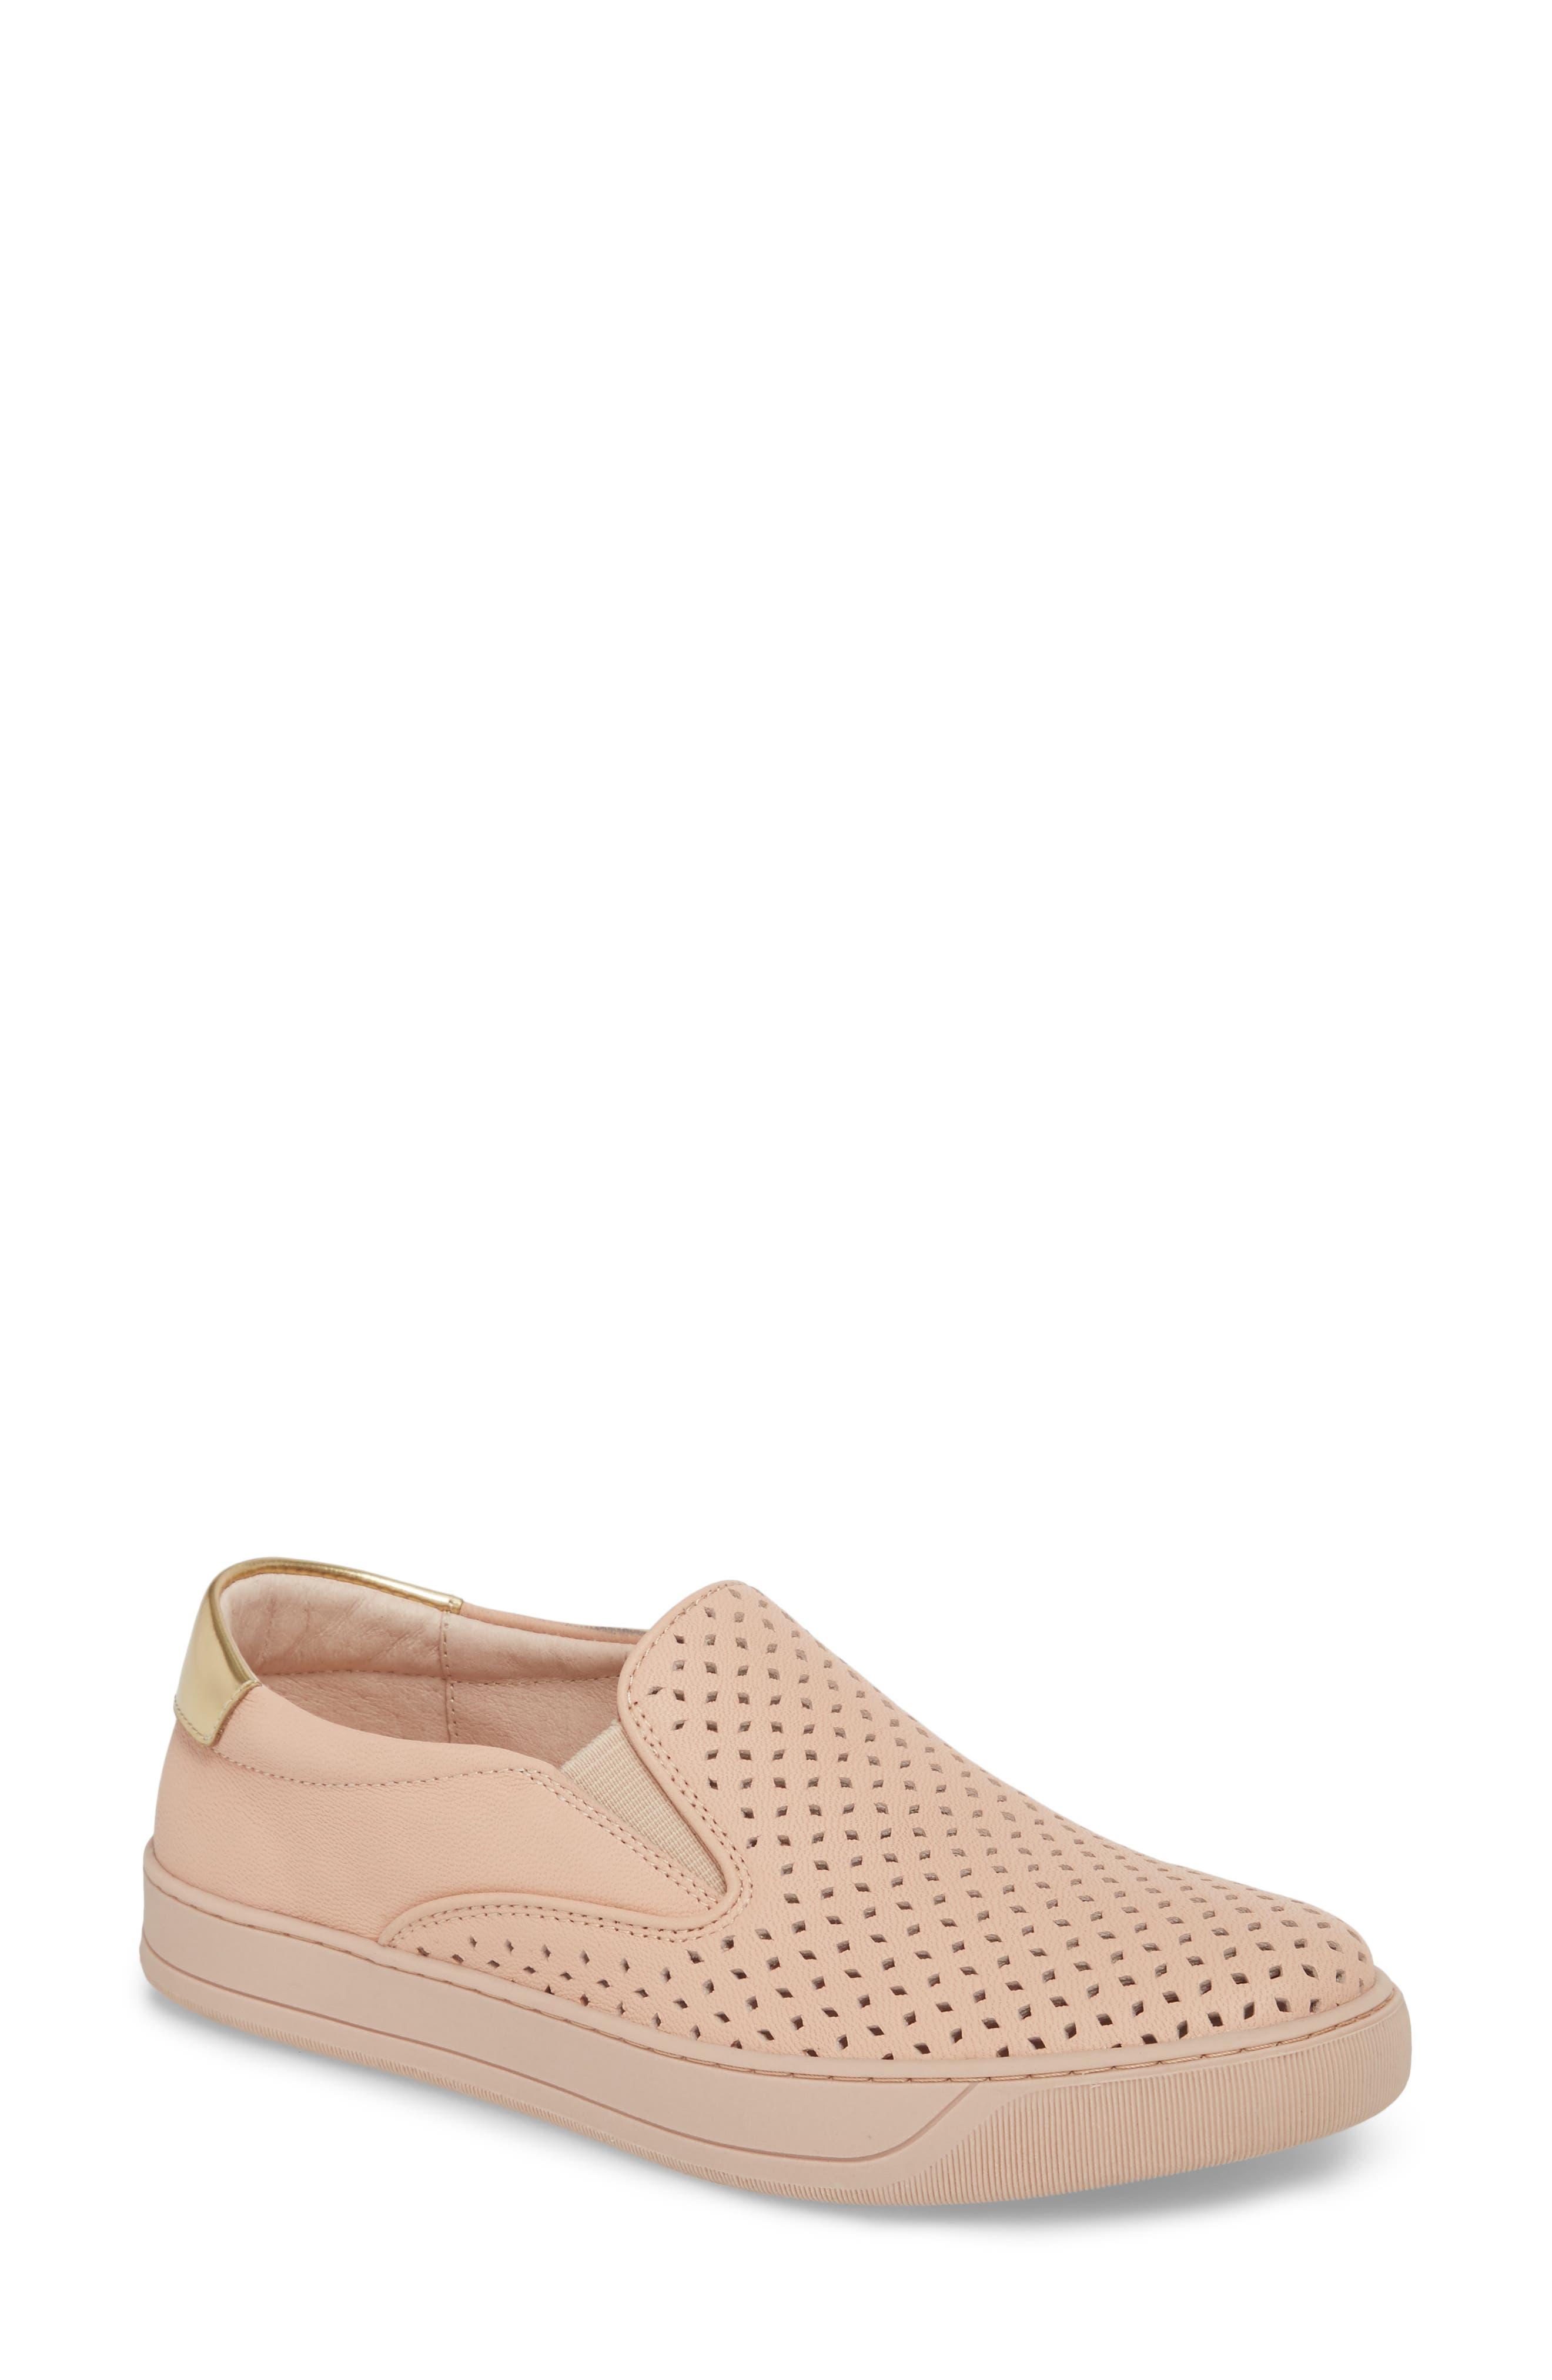 Elaine Slip-On Sneaker,                             Main thumbnail 1, color,                             Pink Leather